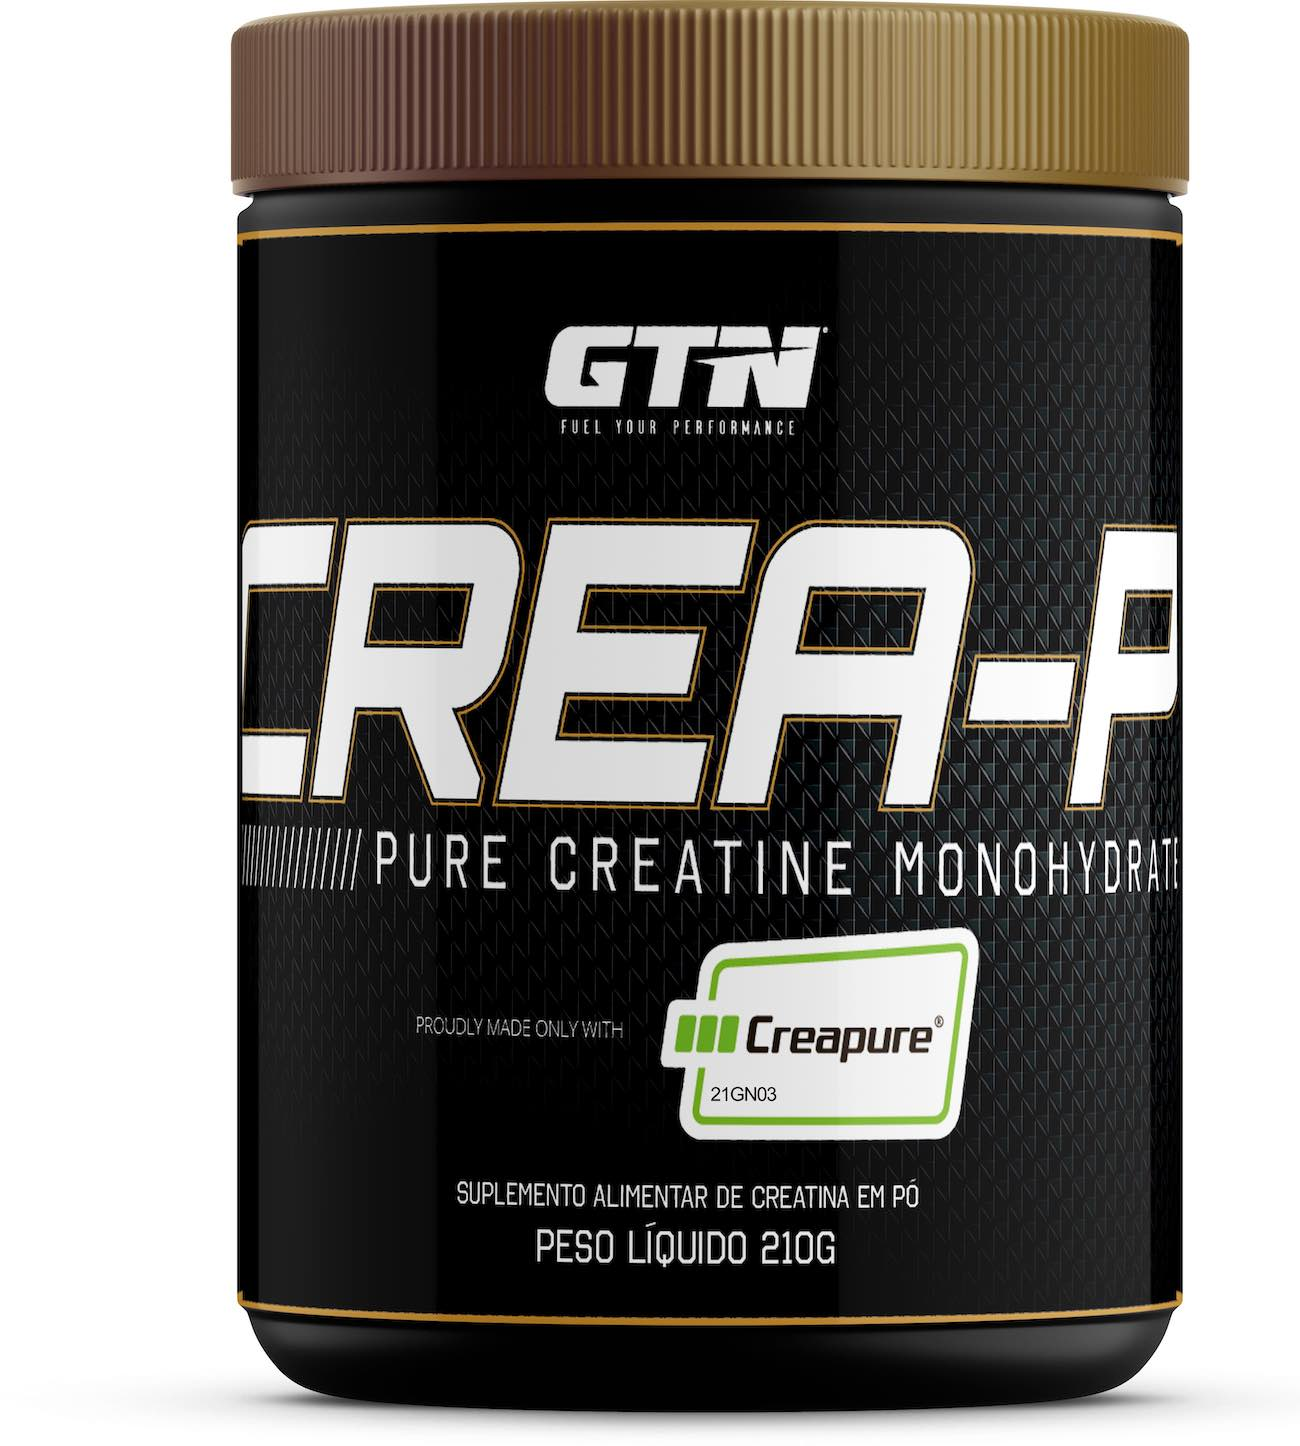 Crea-P Creatina made proudly with 100% Creapure® - 210g